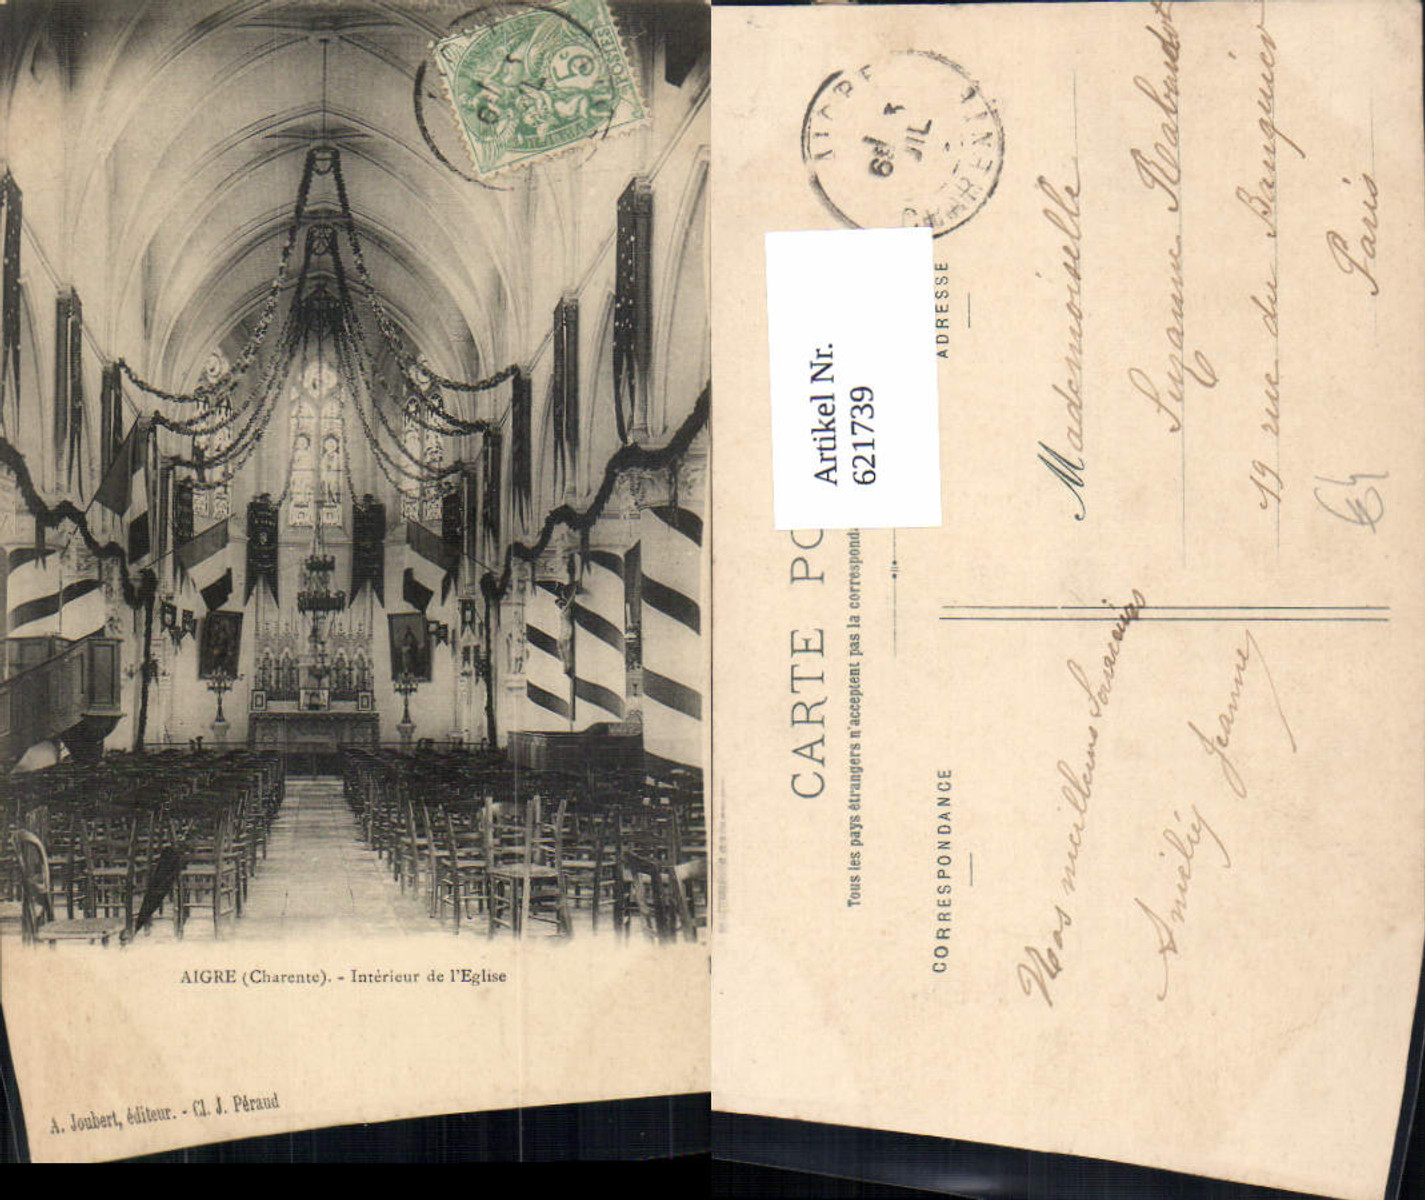 621739,Aigre Charente Interieur de l Eglise Kirche Innenansicht France günstig online kaufen